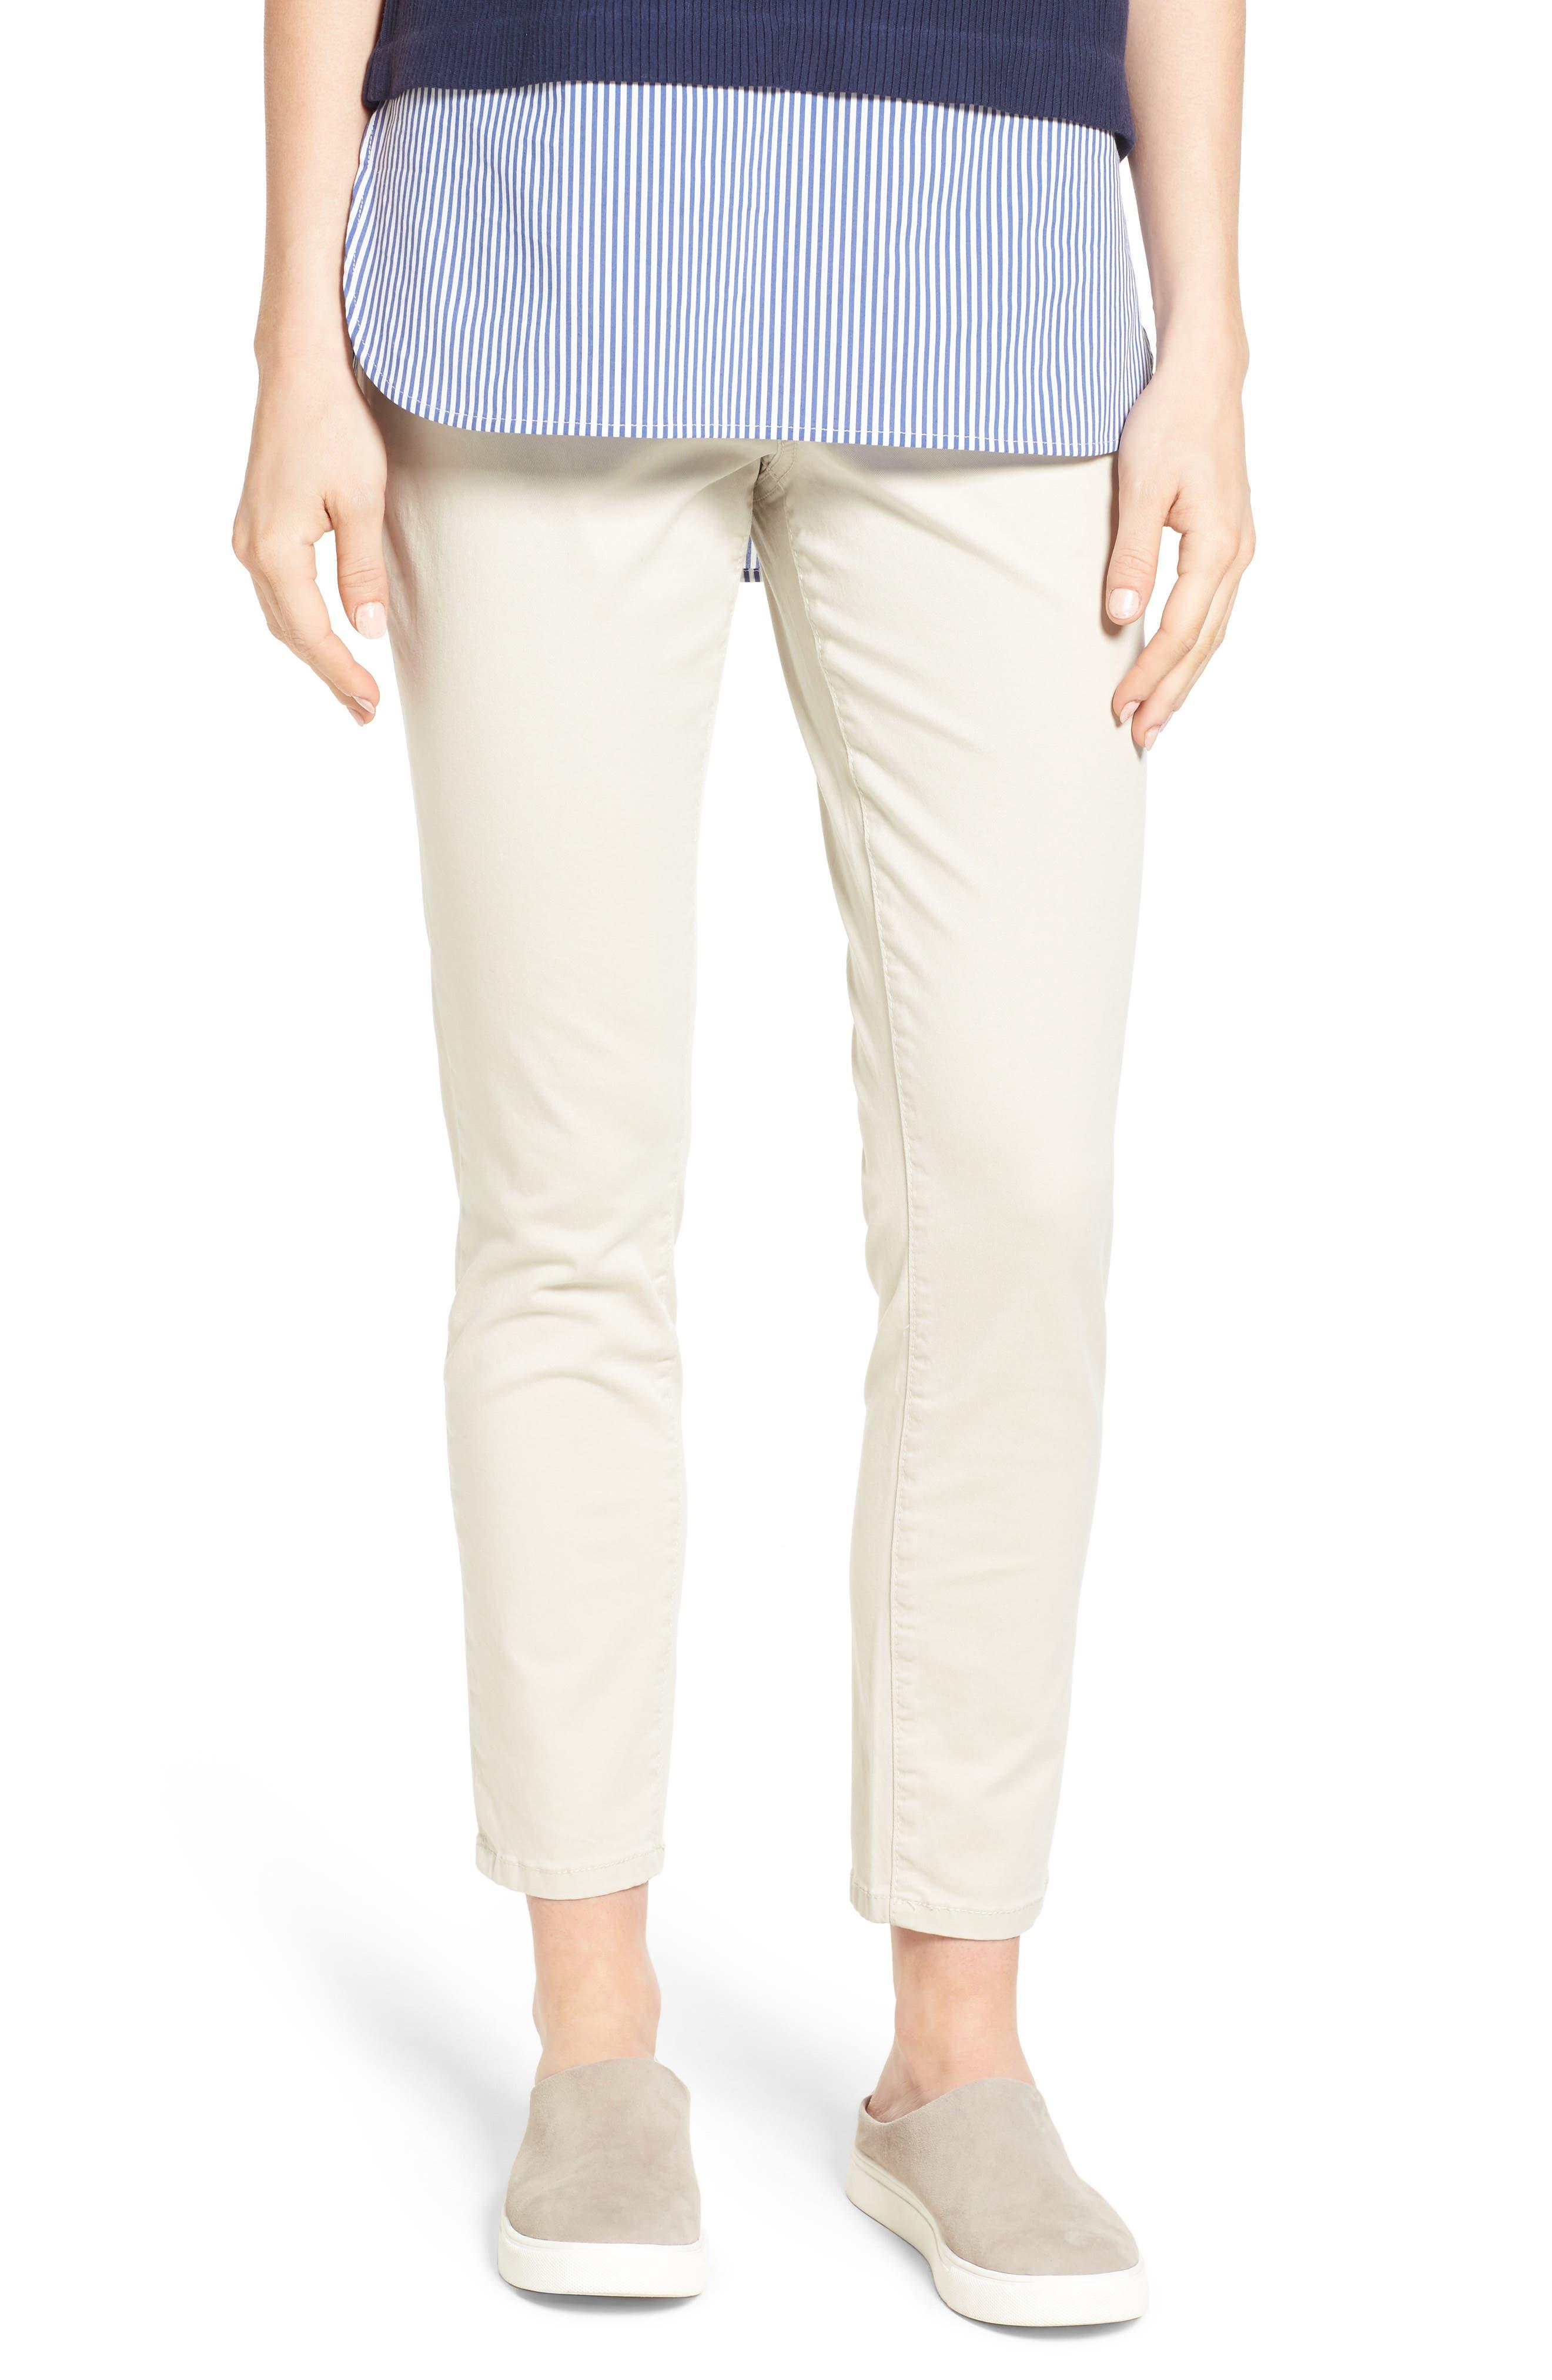 Main Image - Jag Jeans Amelia Pull-On Slim Stretch Twill Ankle Pants (Regular & Petite)